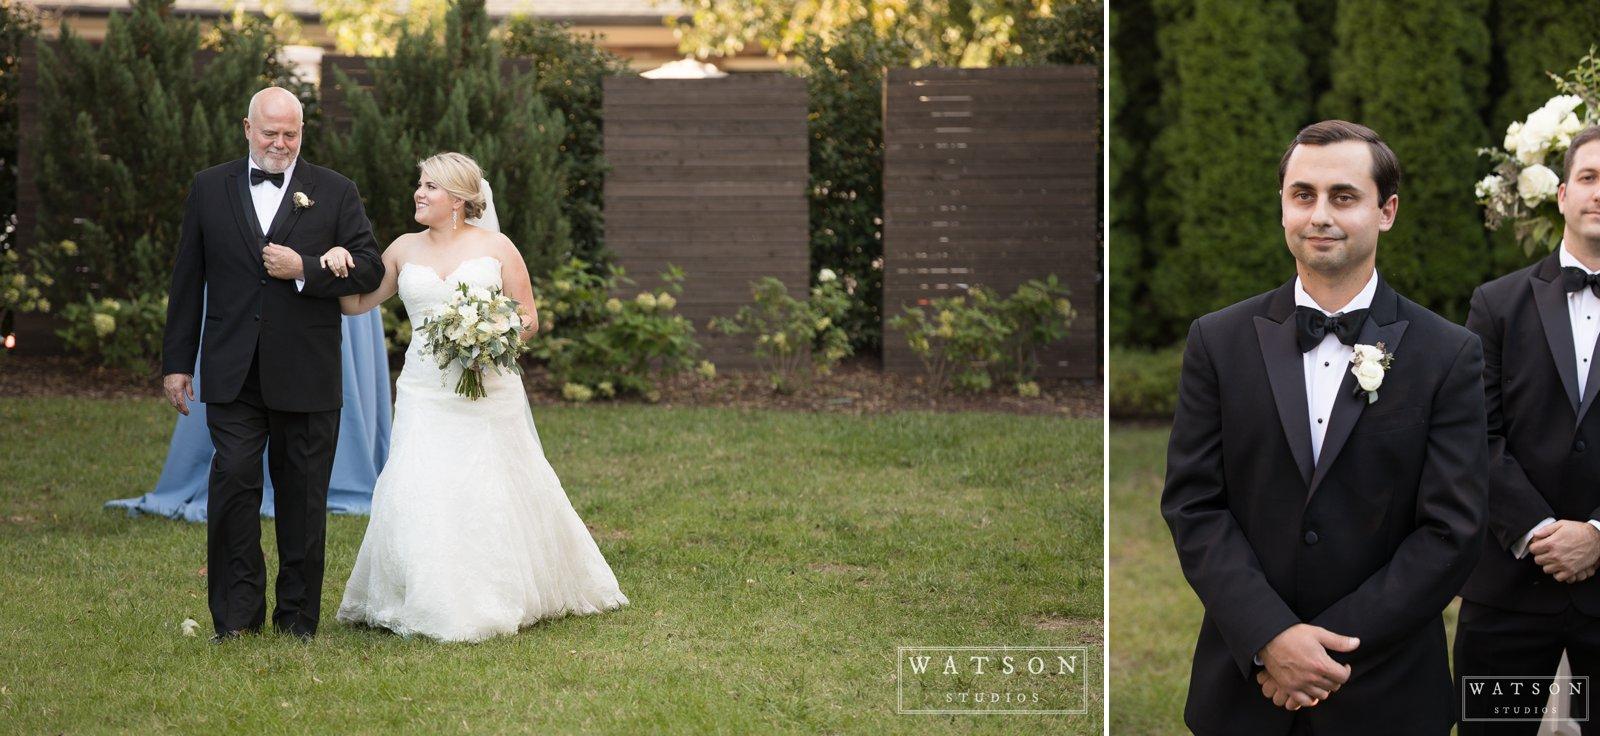 Wedding Ceremony at The Cordelle